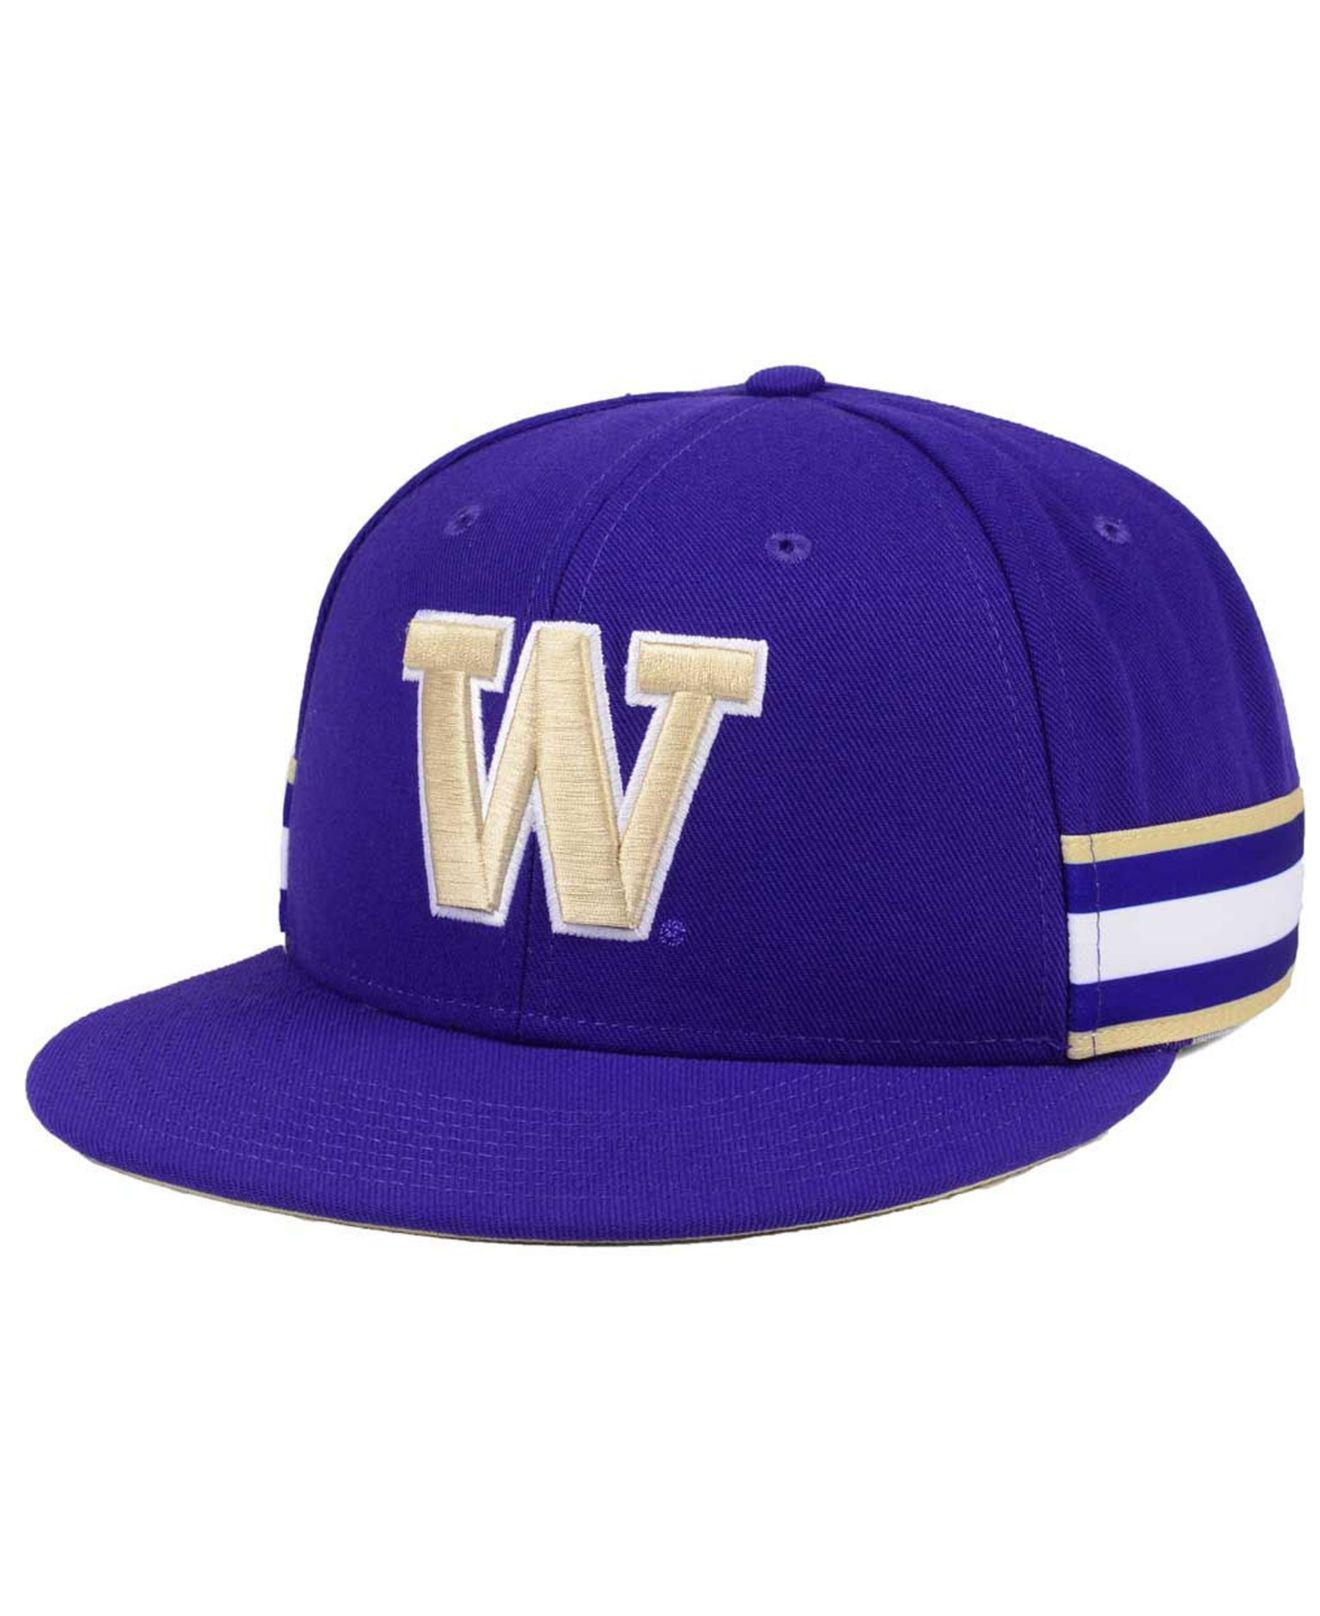 new product 095f0 e873d ... official store nike. mens purple true woven stripe snapback cap 4386d  c443e ...